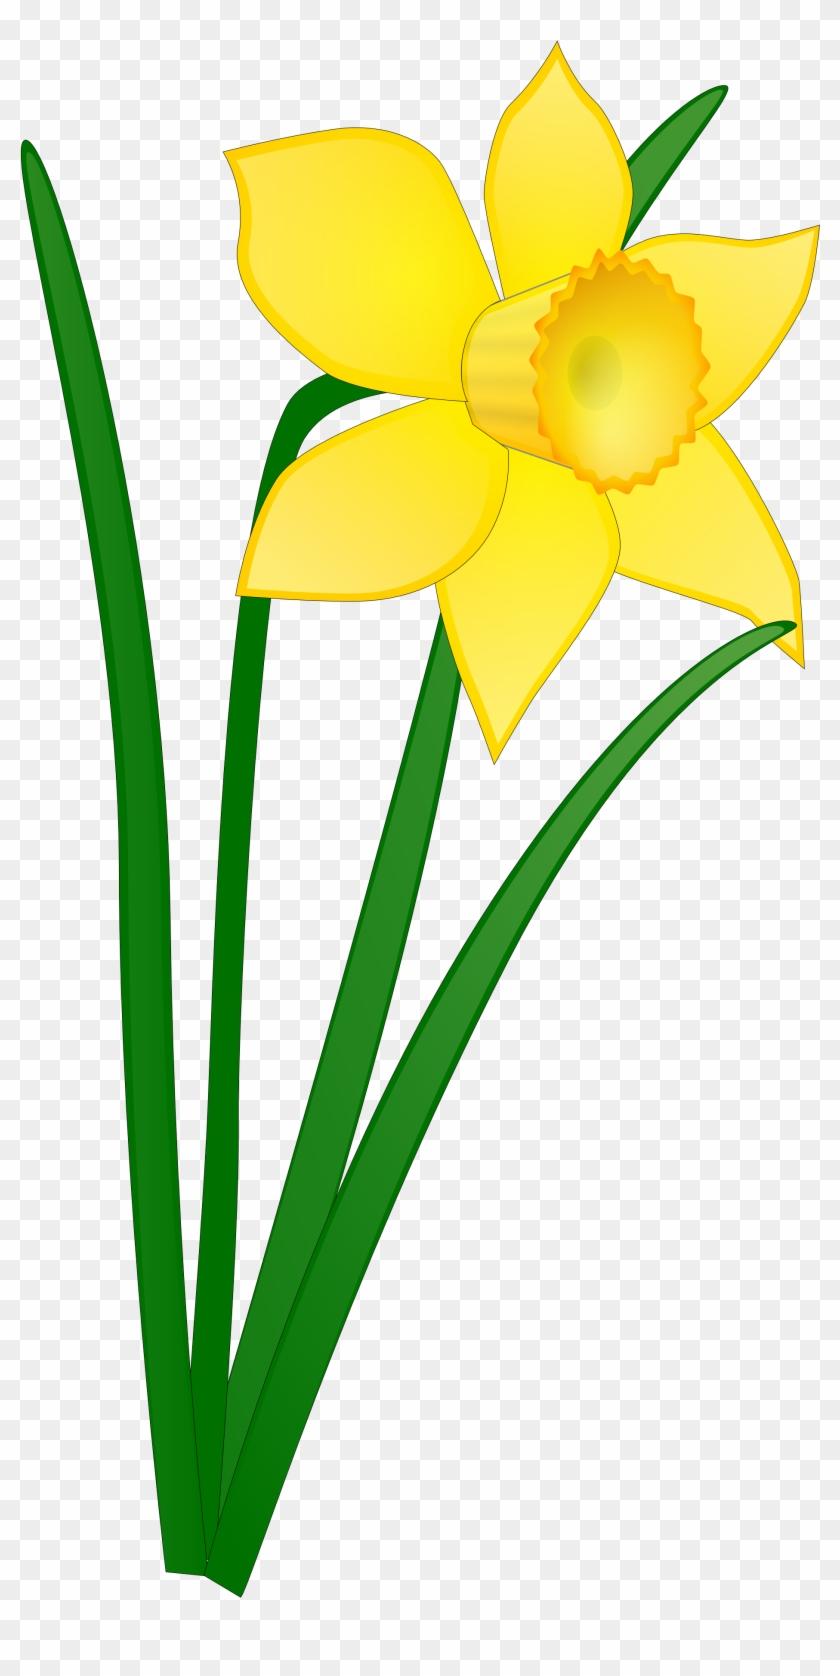 Daffodil Flower Clip Art Clipart Panda Free Clipart - Daffodil Clip Art #95152